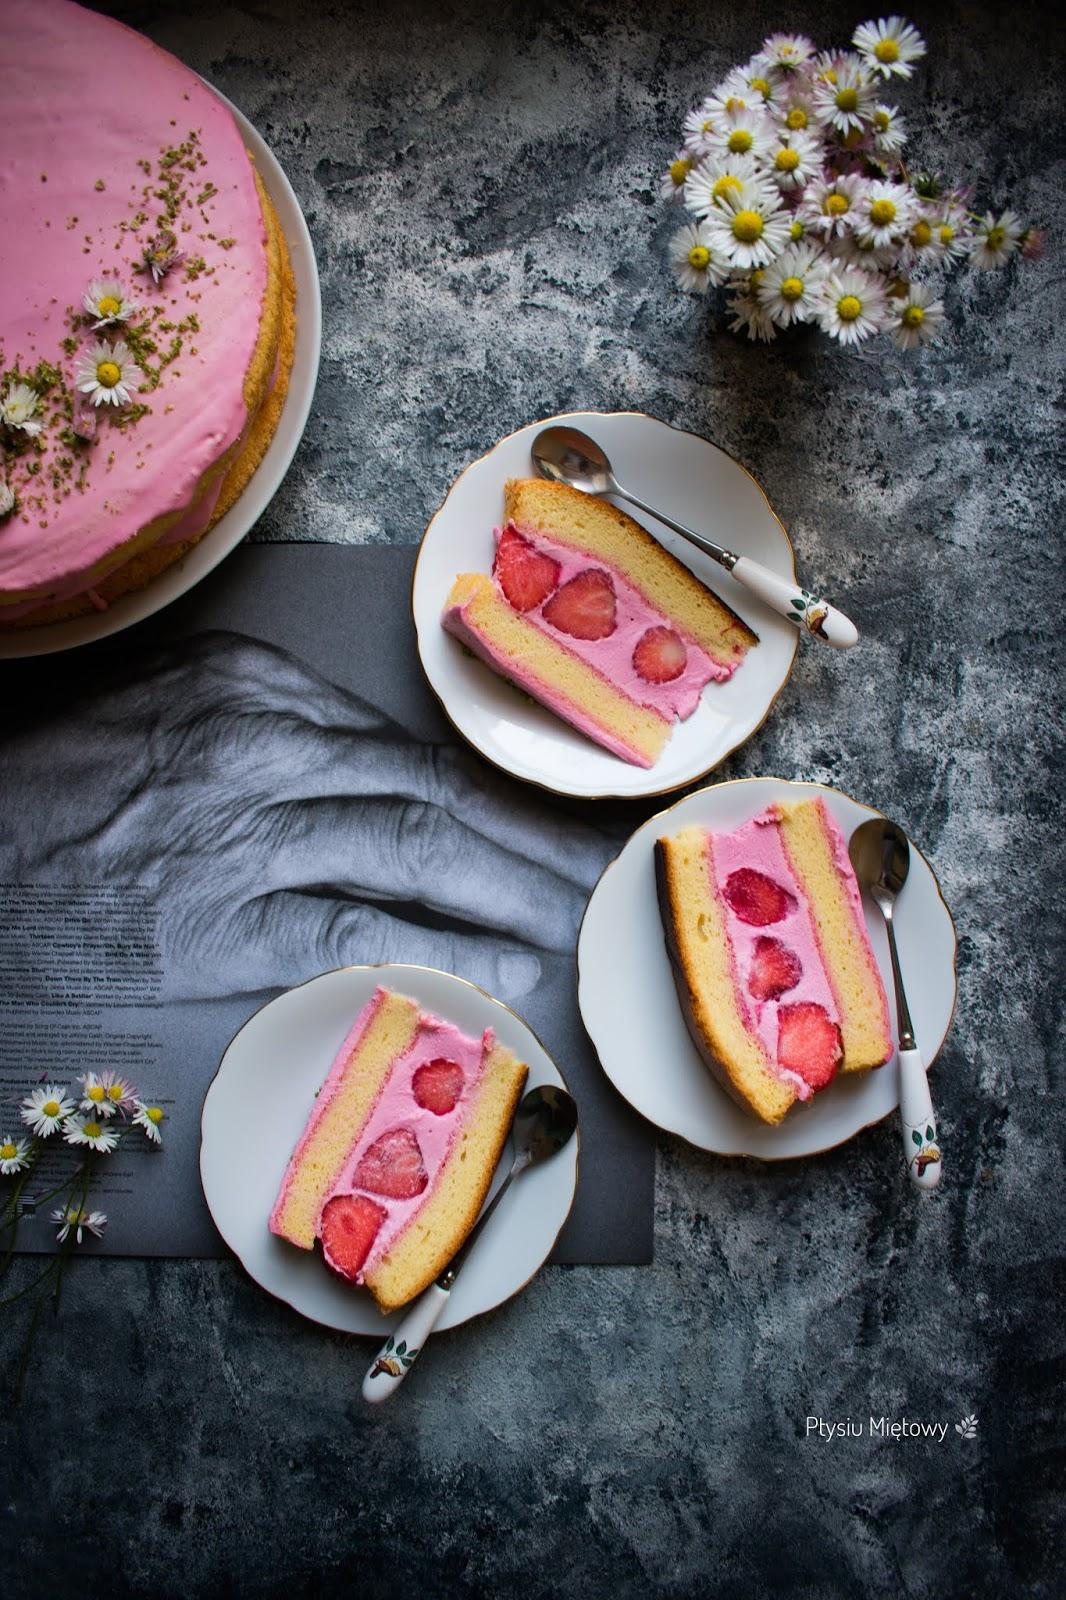 ciasto, deser, ptysiu mietowy